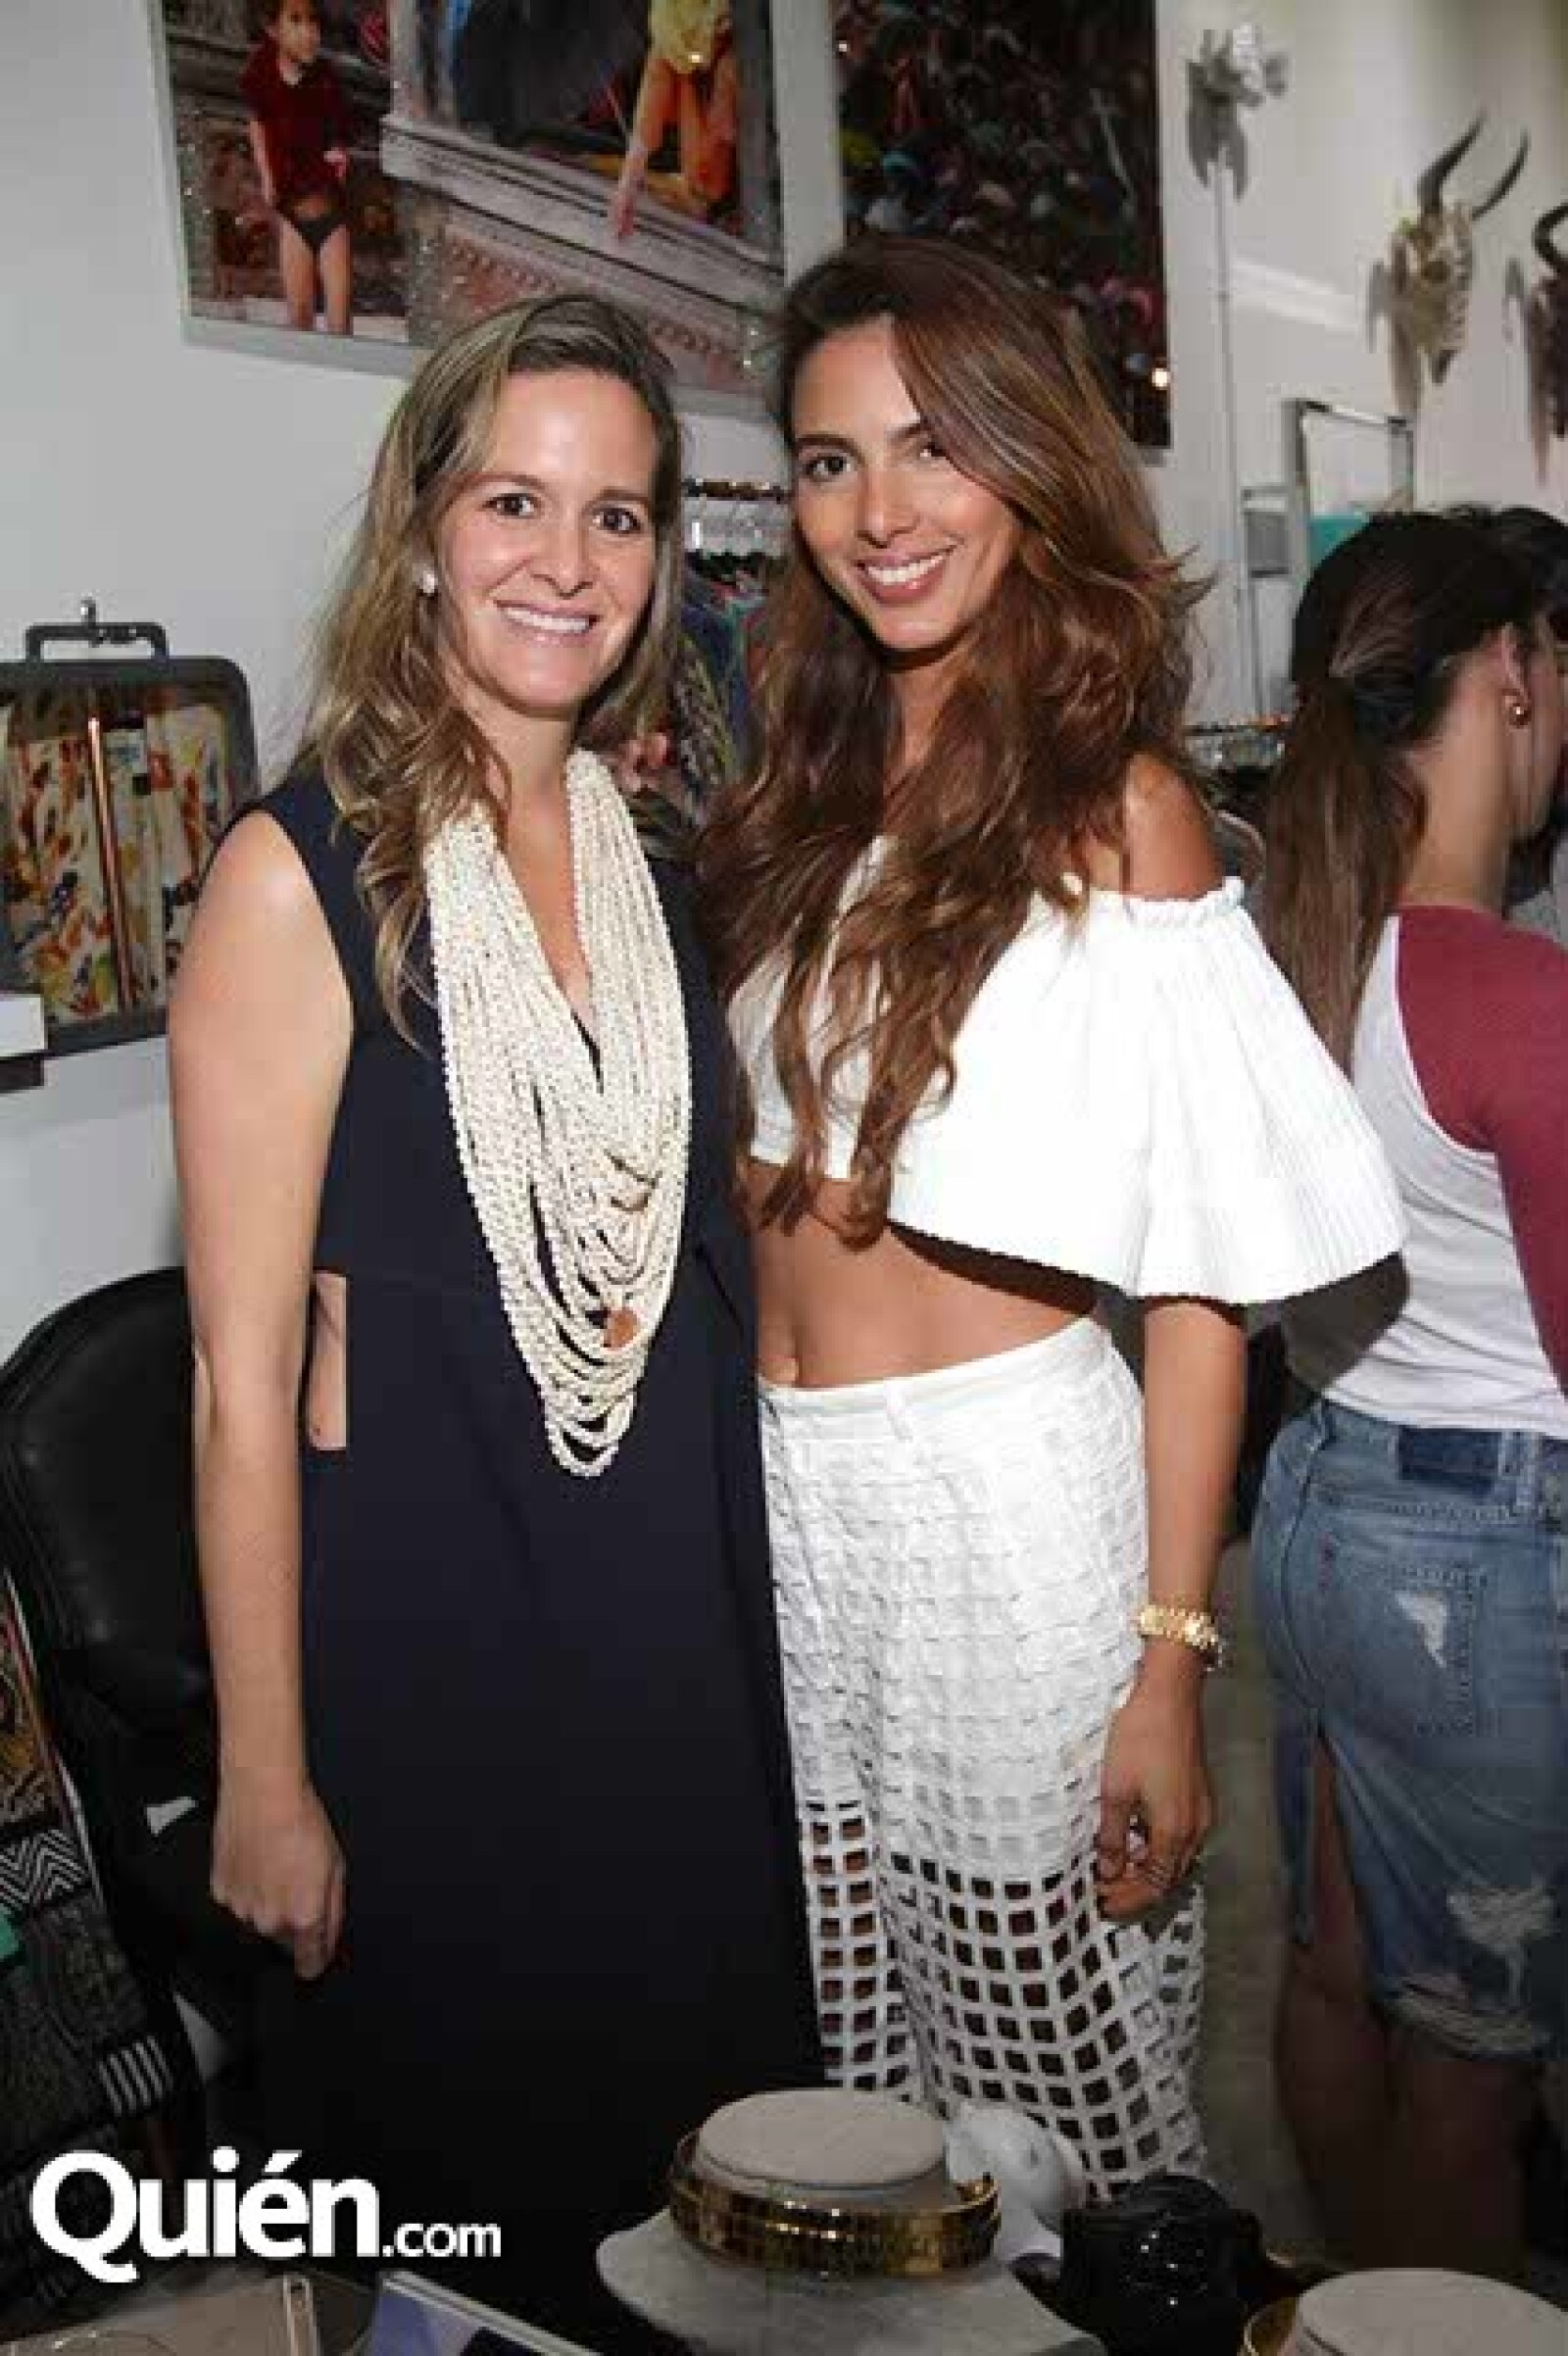 Romina Amkle y Cristina Alcerra